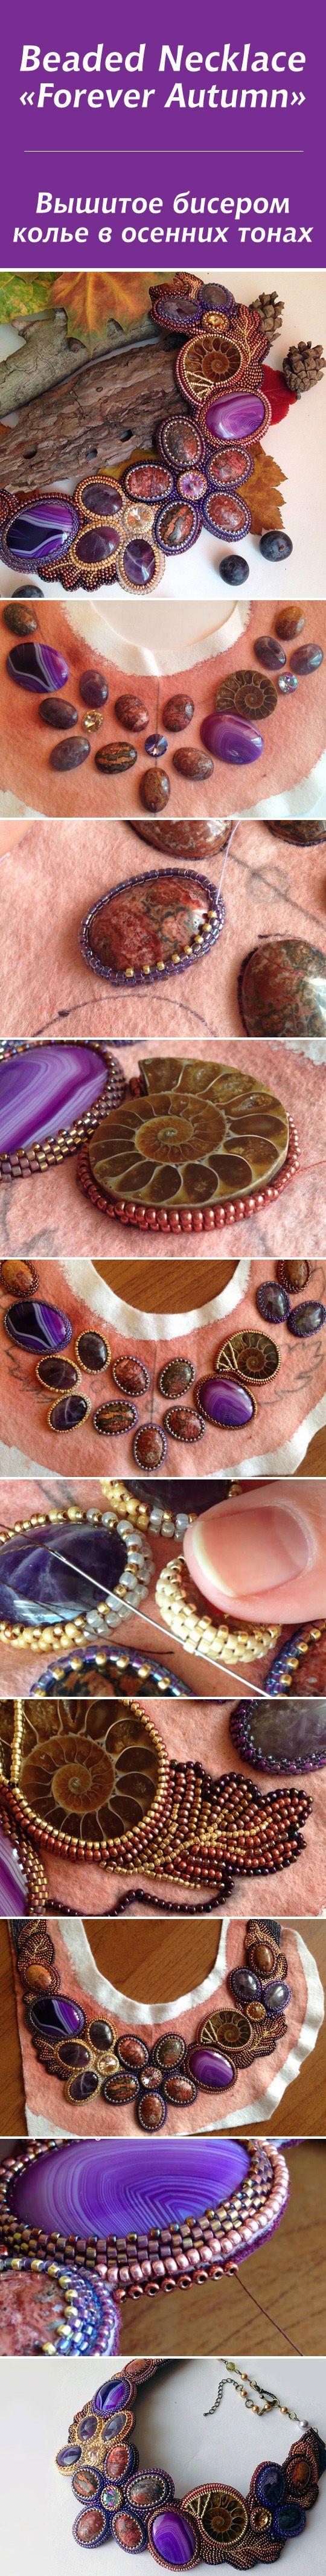 "* Мастер-класс по изготовлению колье из бисера ""Forever Autumn"" #beadwork"